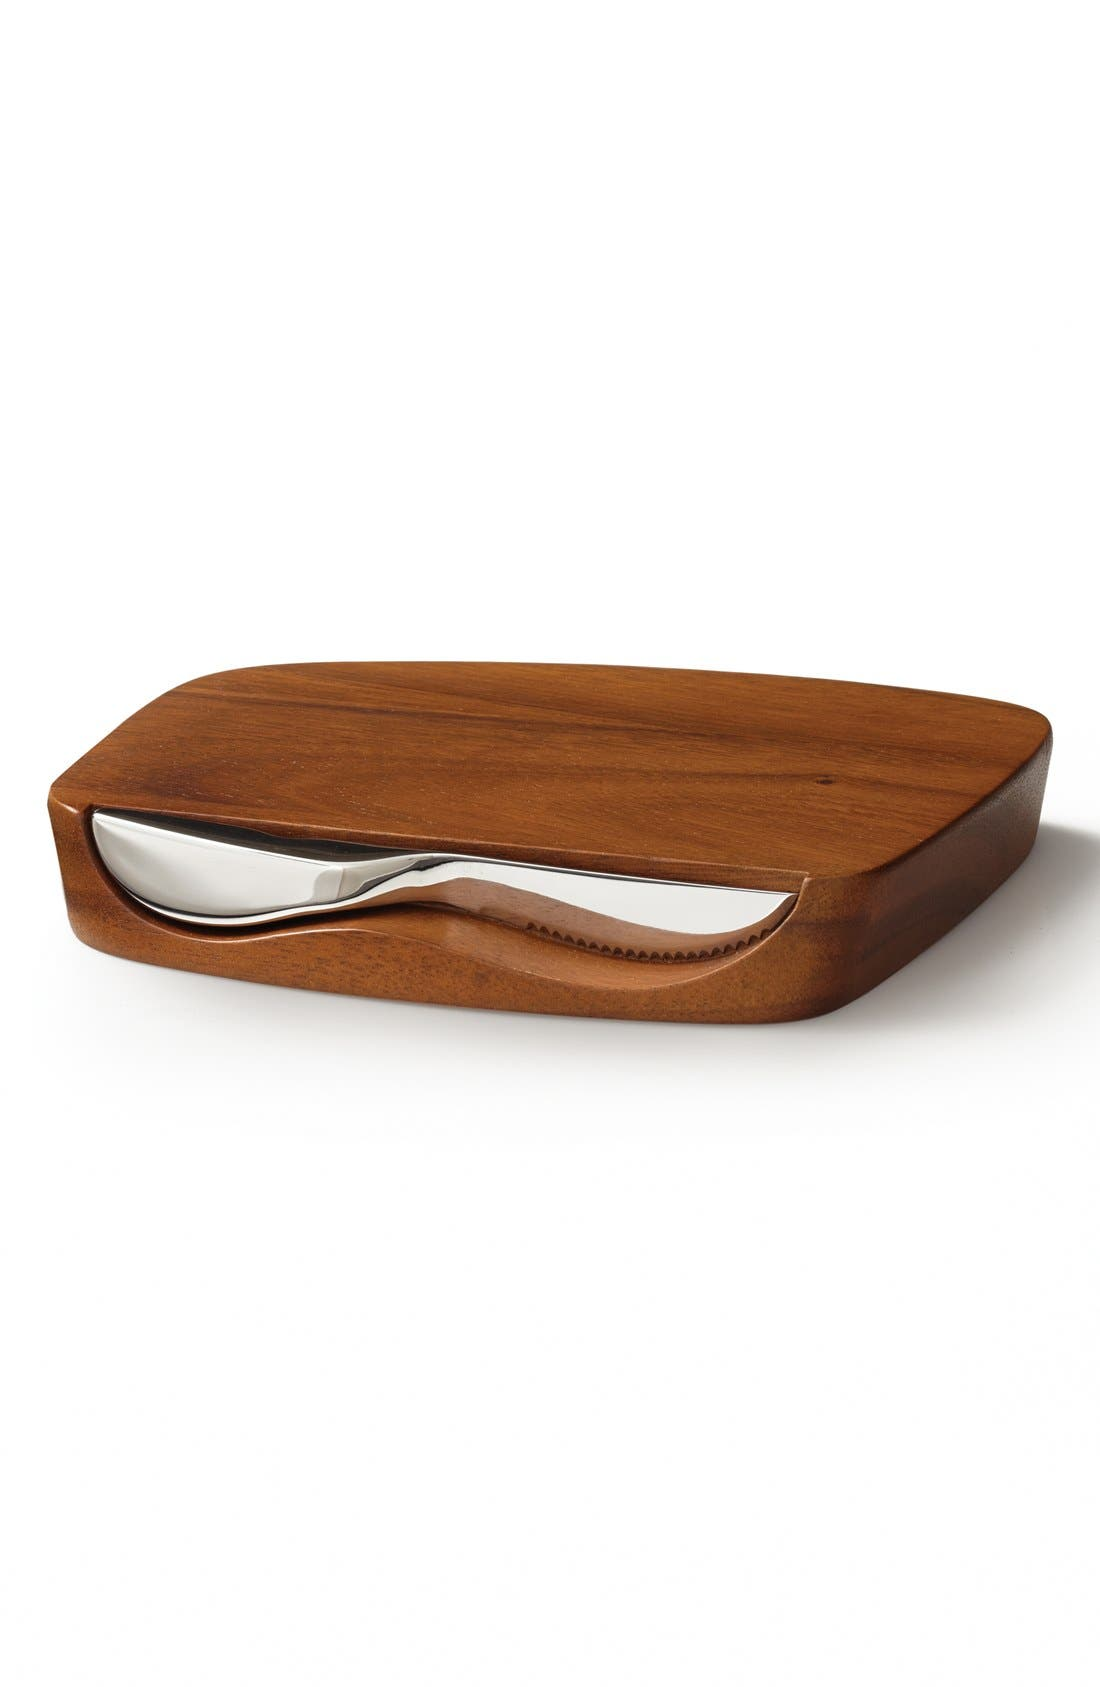 'Blend' Bar Board & Knife,                         Main,                         color, SILVER